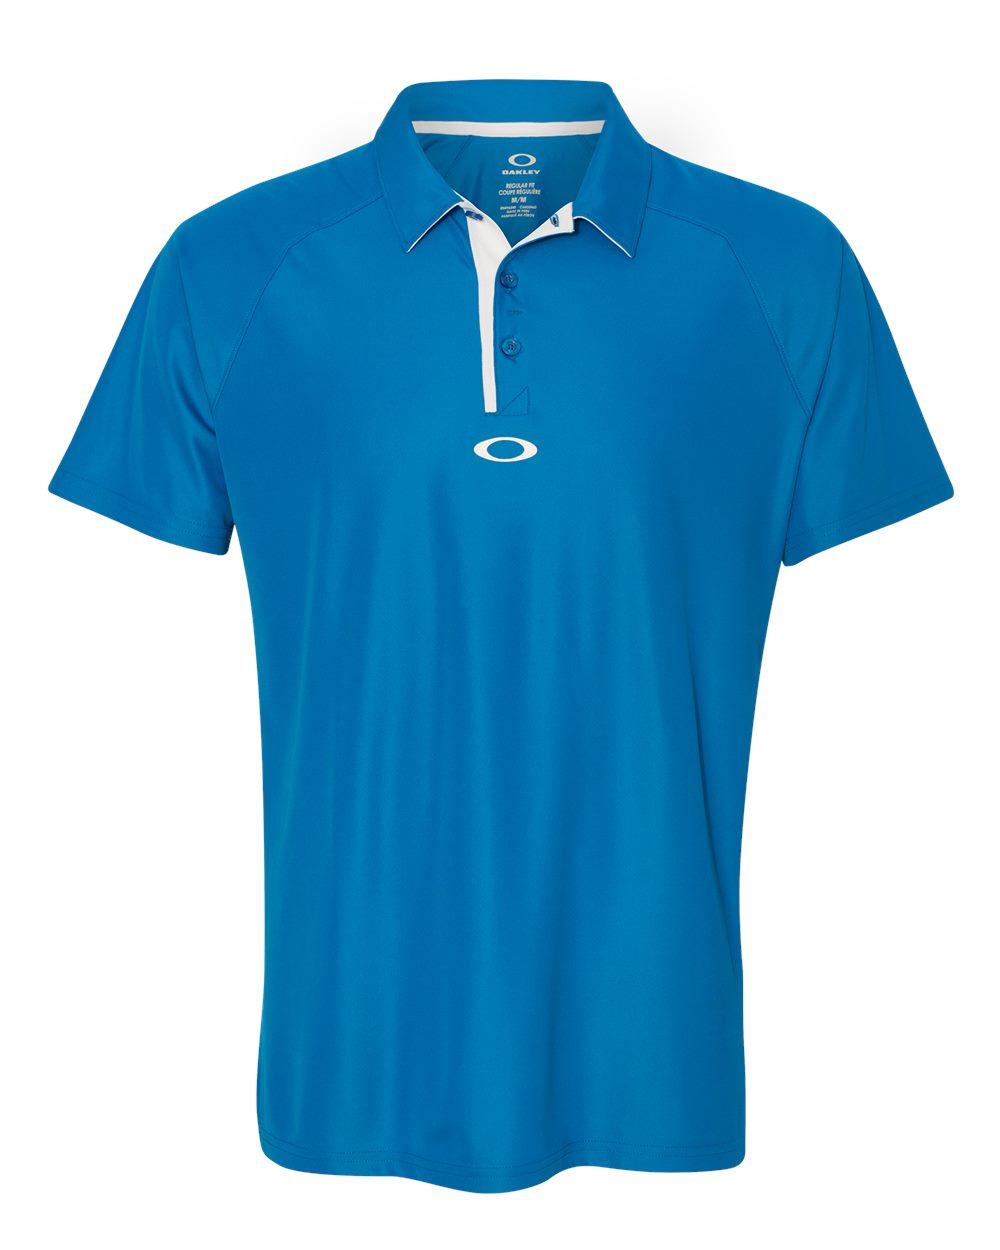 Oakley custom polo men 39 s elemental 432632 logo shirts direct for Name brand golf shirts direct